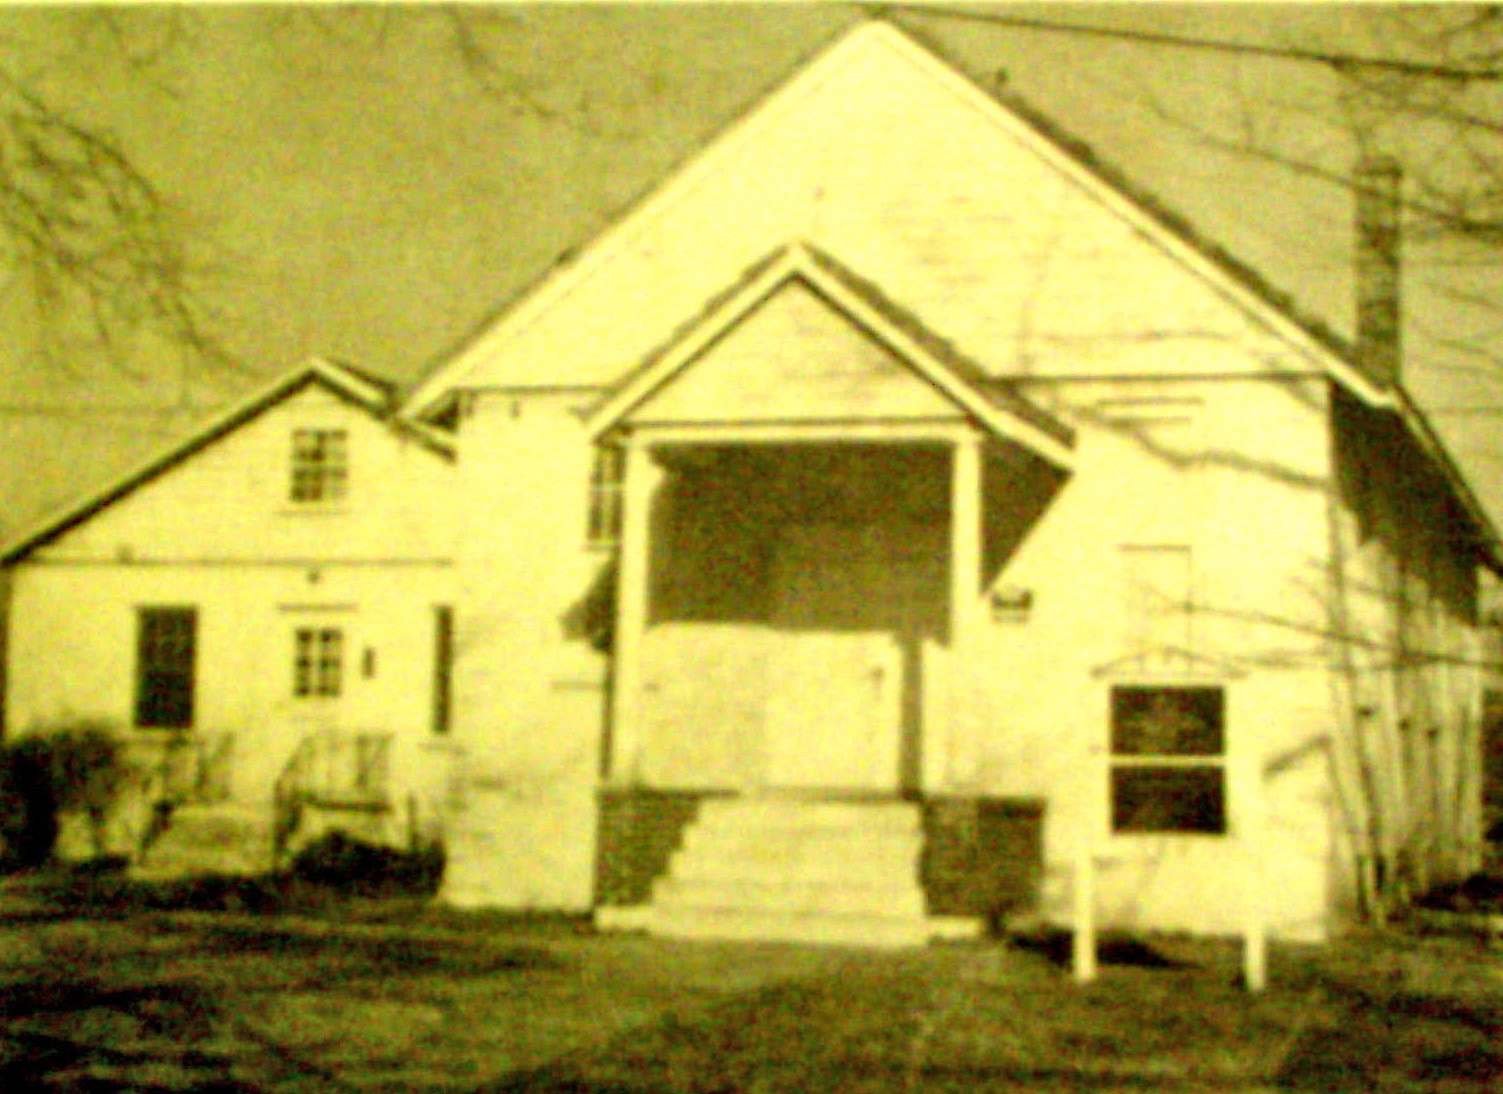 1-*SECOND BAPTIST CHURCH 1st. SITE OF CHURCH (1913) METUCHEN, NEW JERSEY (c. SECOND BAPTIST CHURCH) copy